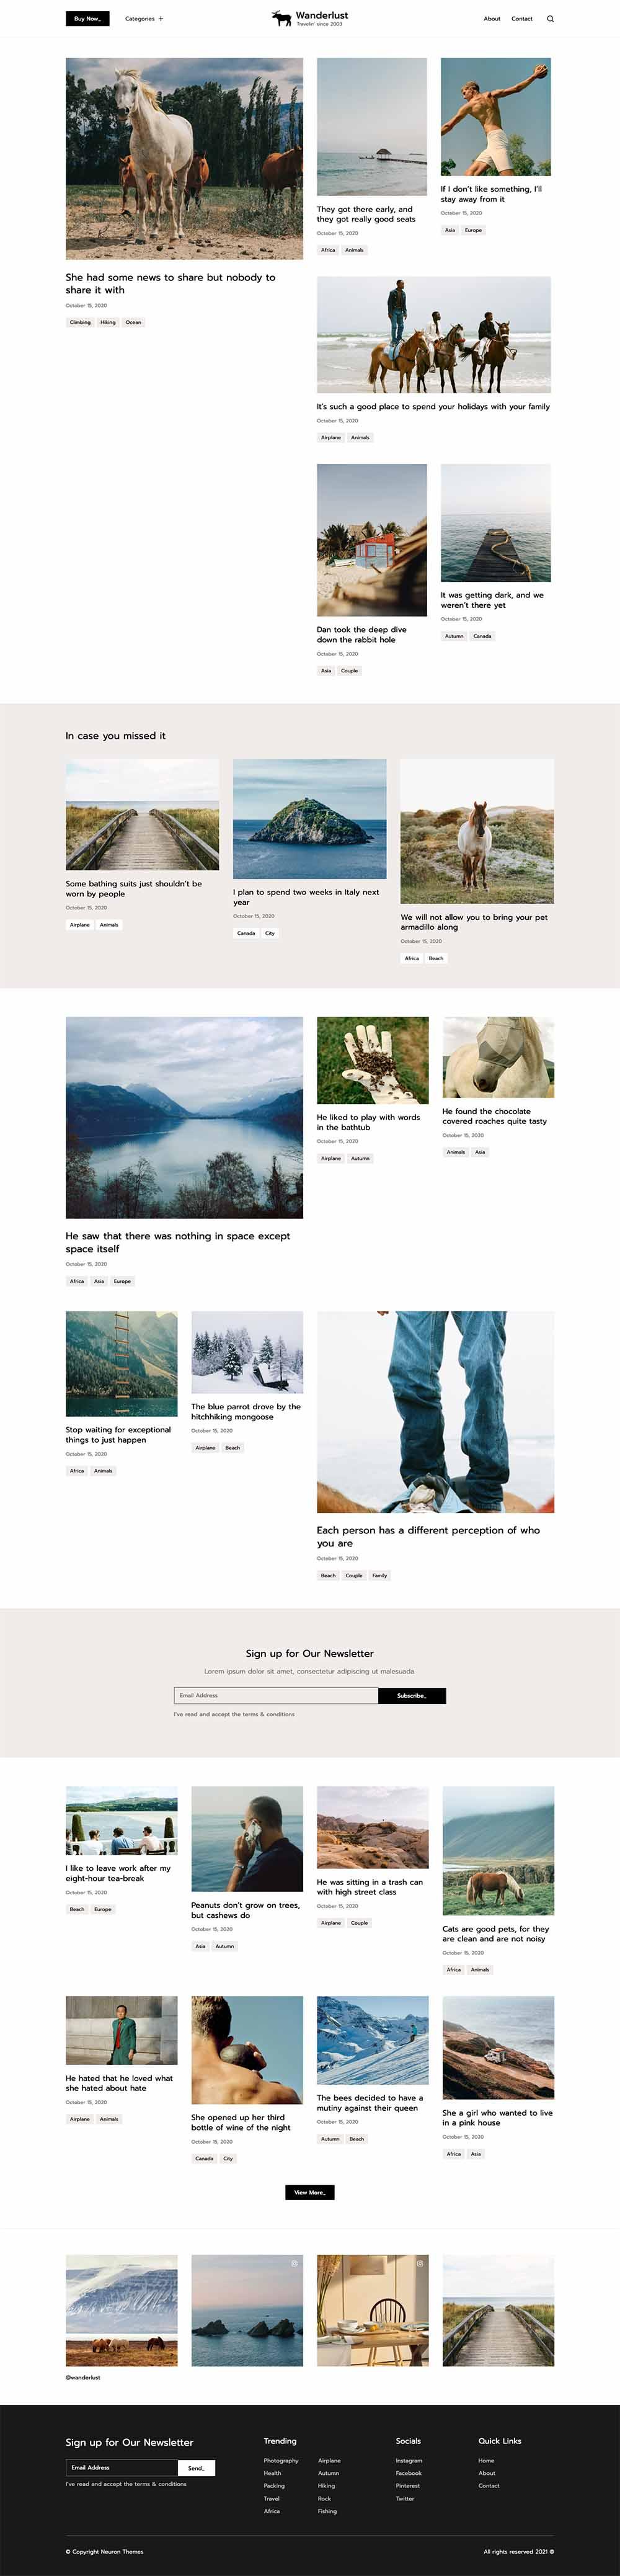 Wanderlust Traveler Personal Blog Demo Website for WordPress